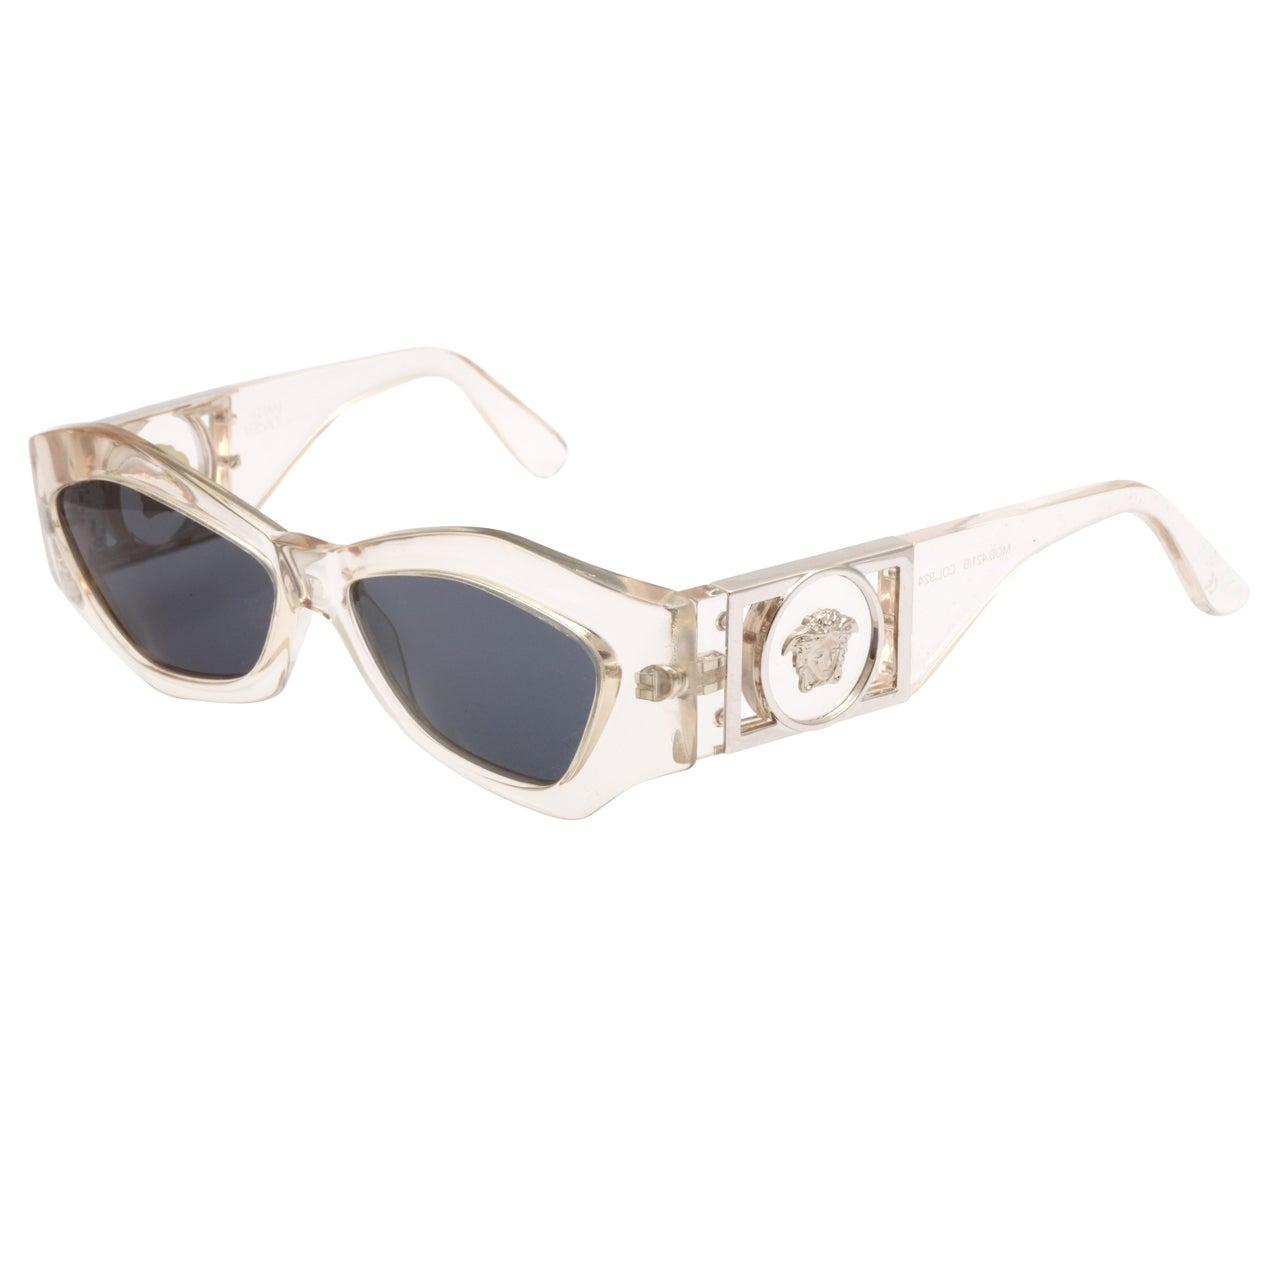 Vintage Gianni Versace Wayfarer Sunglasses Mod 405 | ISEFAC Alternance